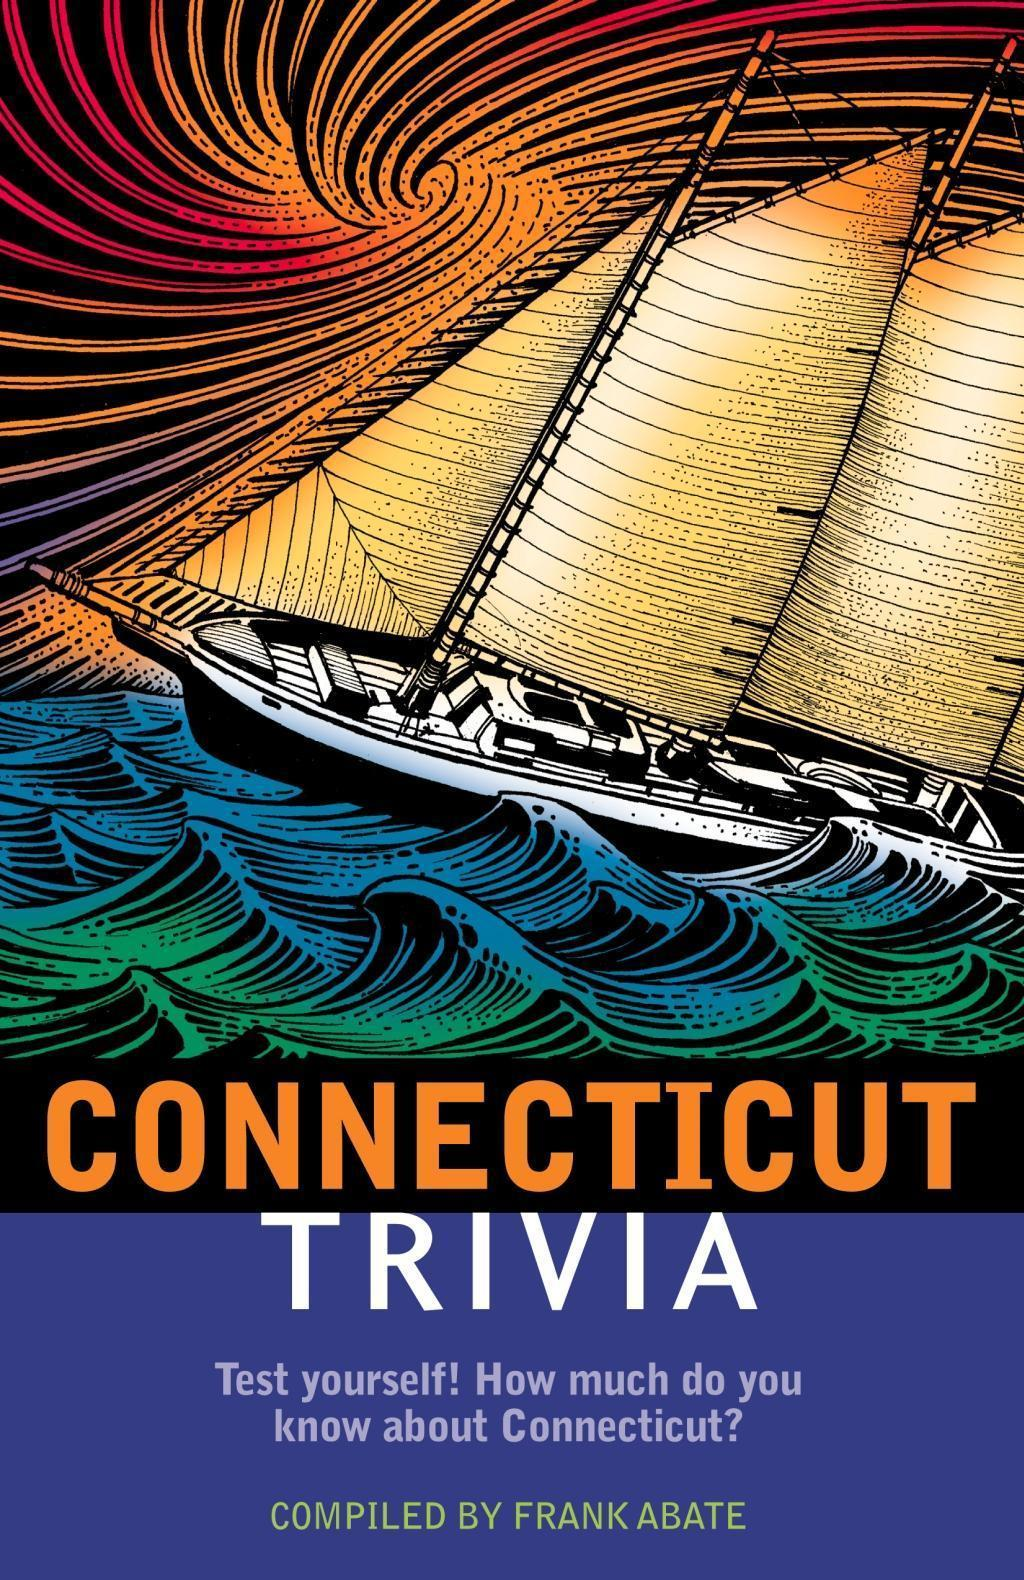 Connecticut Trivia